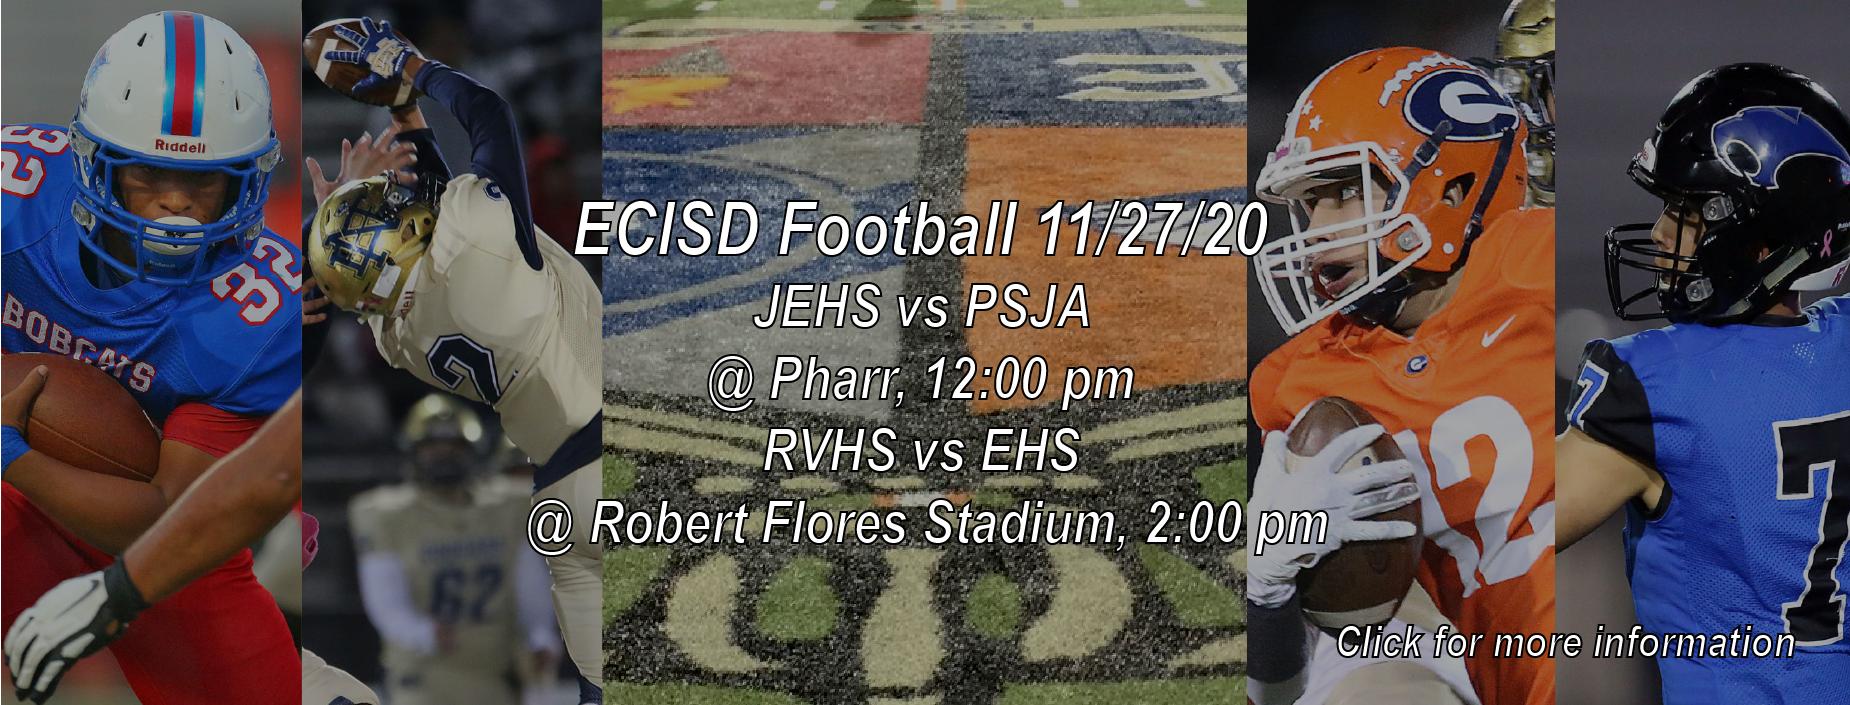 ECISD Football 11/27/20 JEHS vs PSJA @ Pharr, 12:00 pm  RVHS vs EHS @ Robert Flores Stadium, 2:00 pm  Tickets sales: Friday game day 8:00 am - 1:00 pm